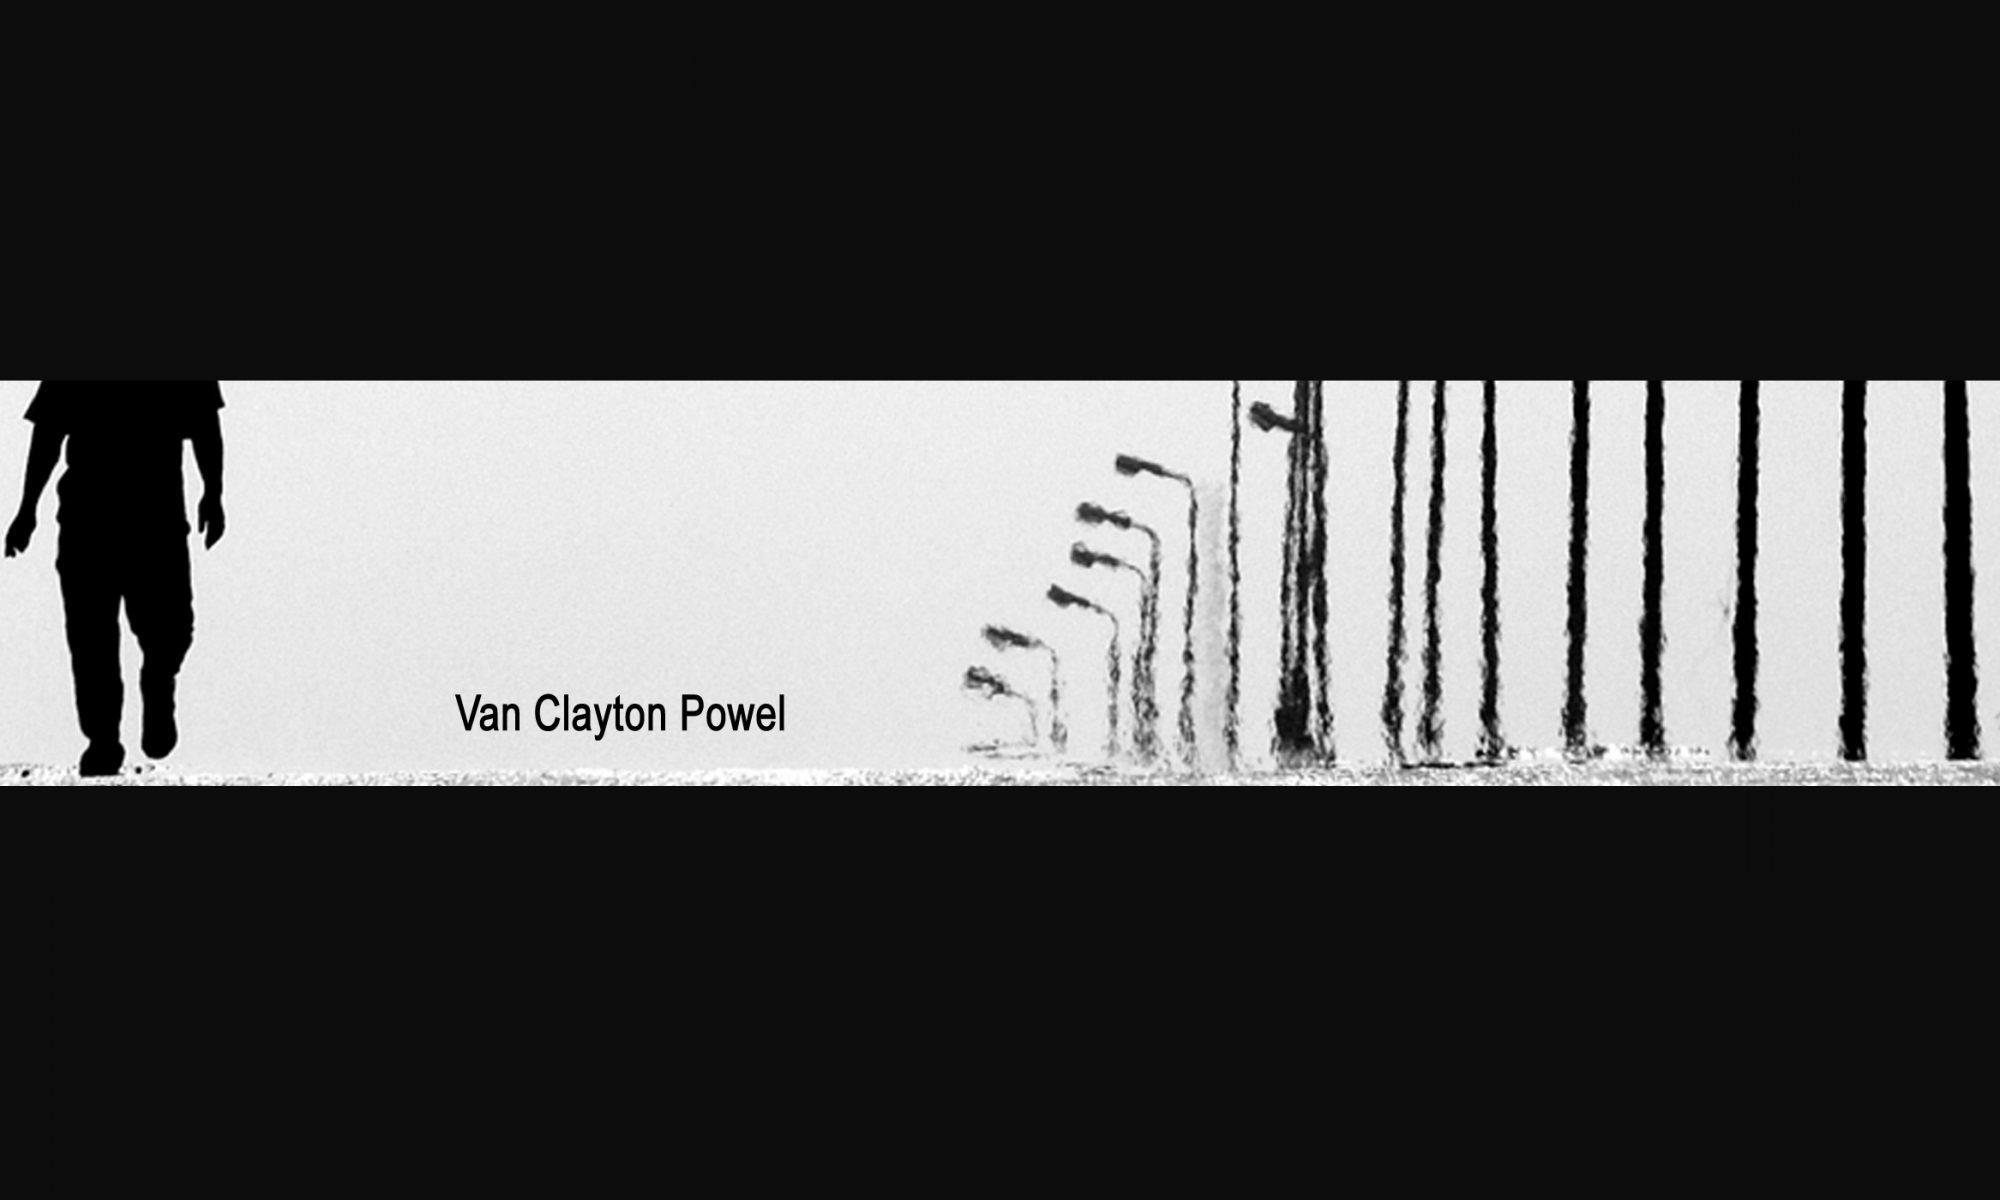 Van Clayton Powel